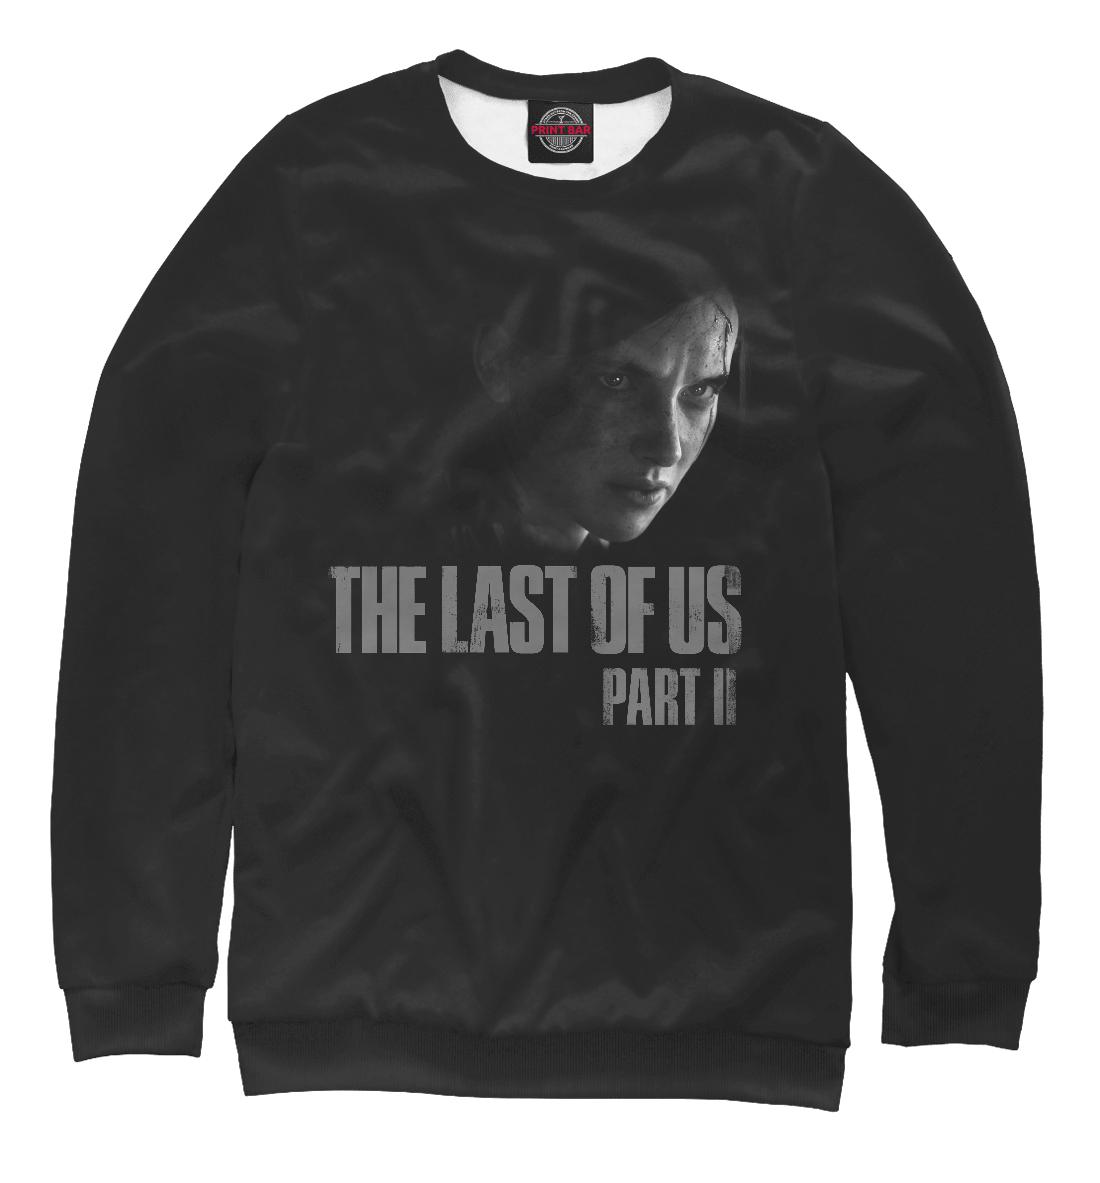 Купить The Last of Us 2, Printbar, Свитшоты, RPG-339173-swi-2